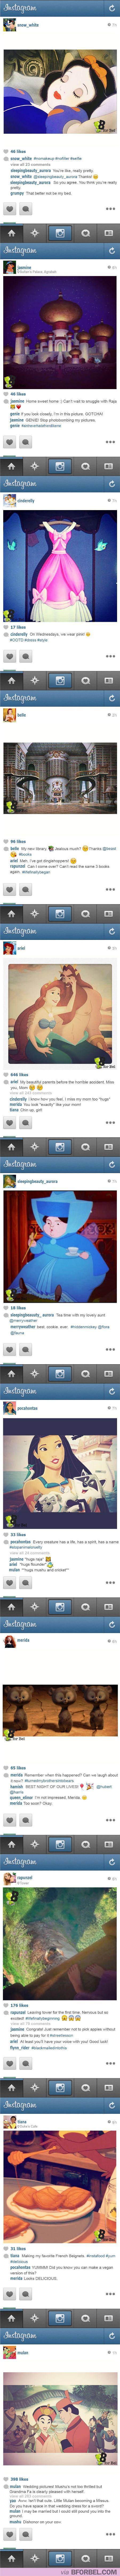 If-Disney-Princesses-Had-Instagram